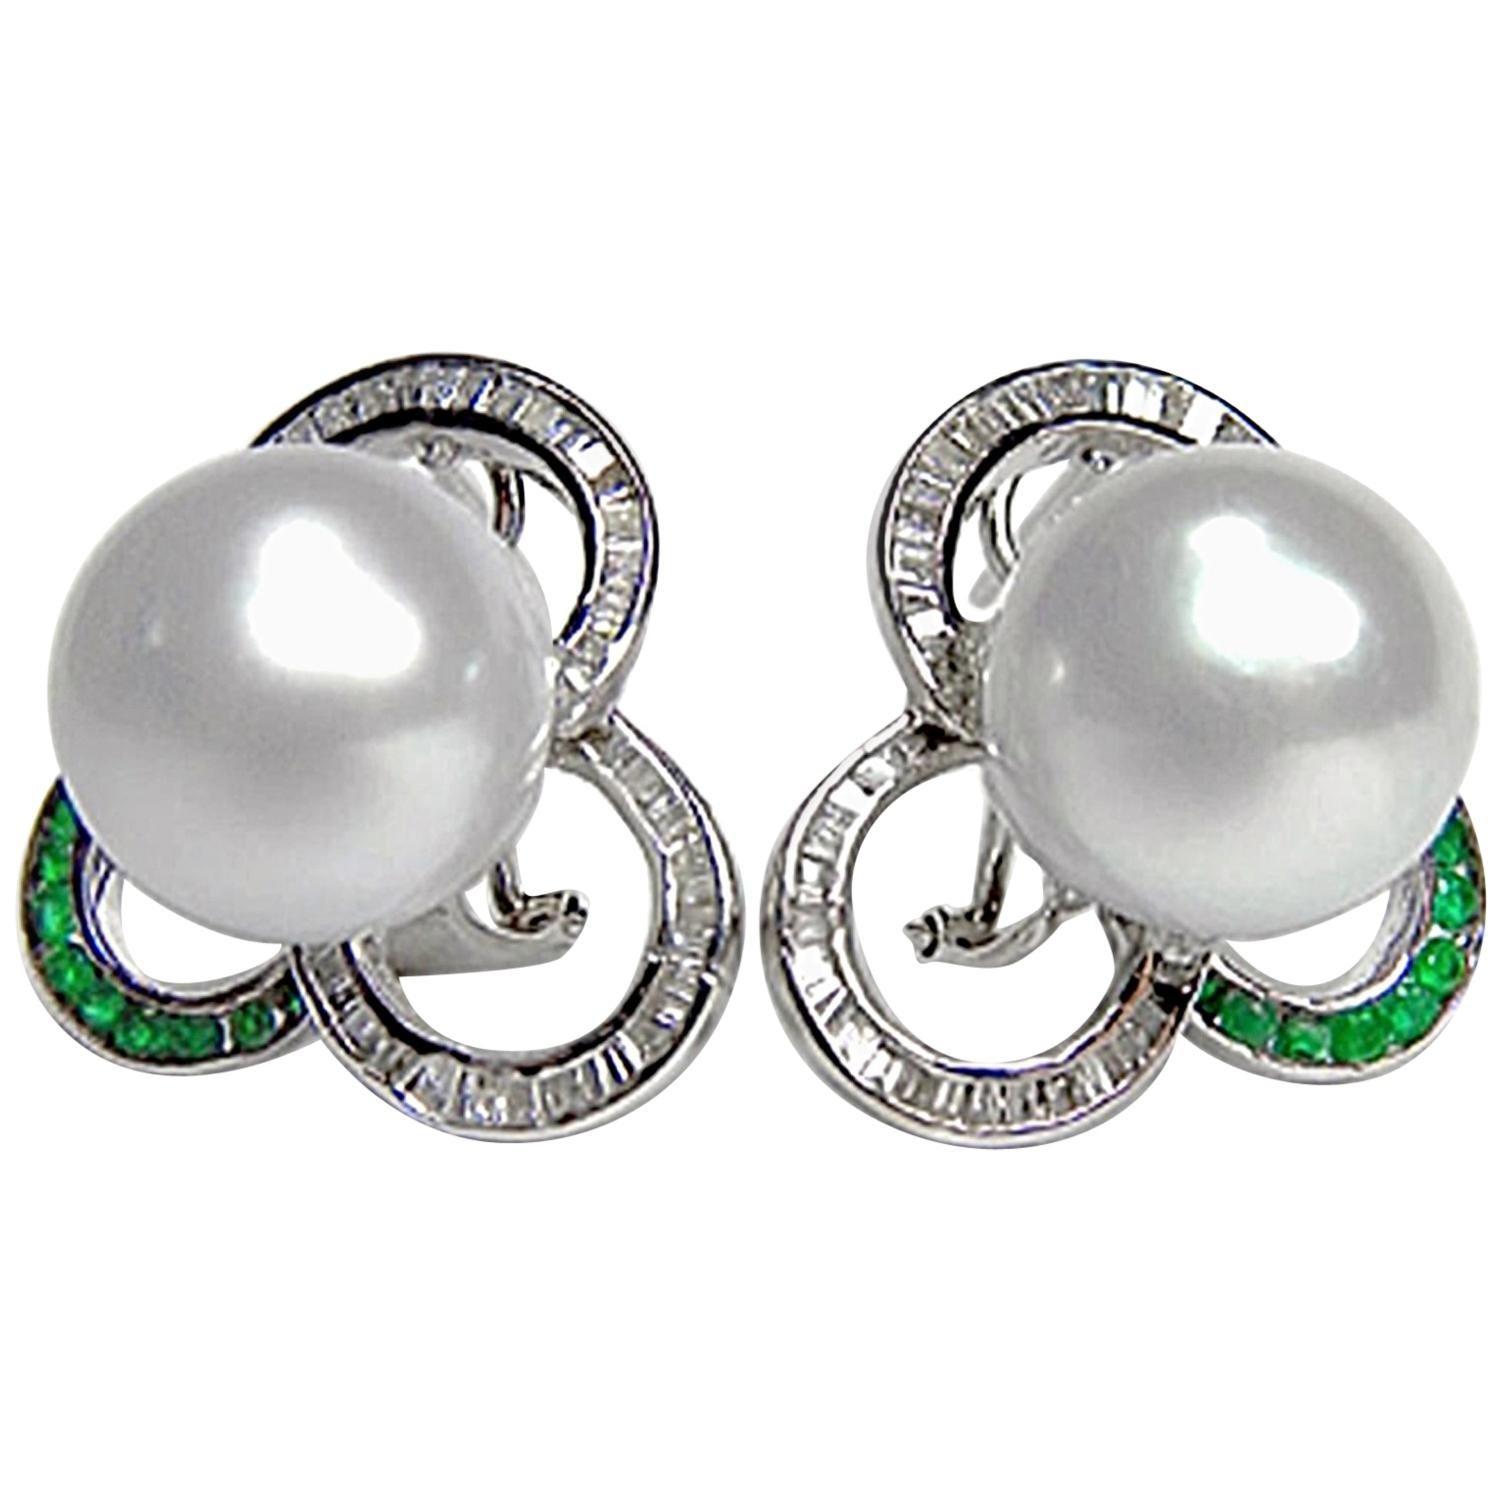 South Sea Pearl Diamond and Emerald Earrings 18 Karat